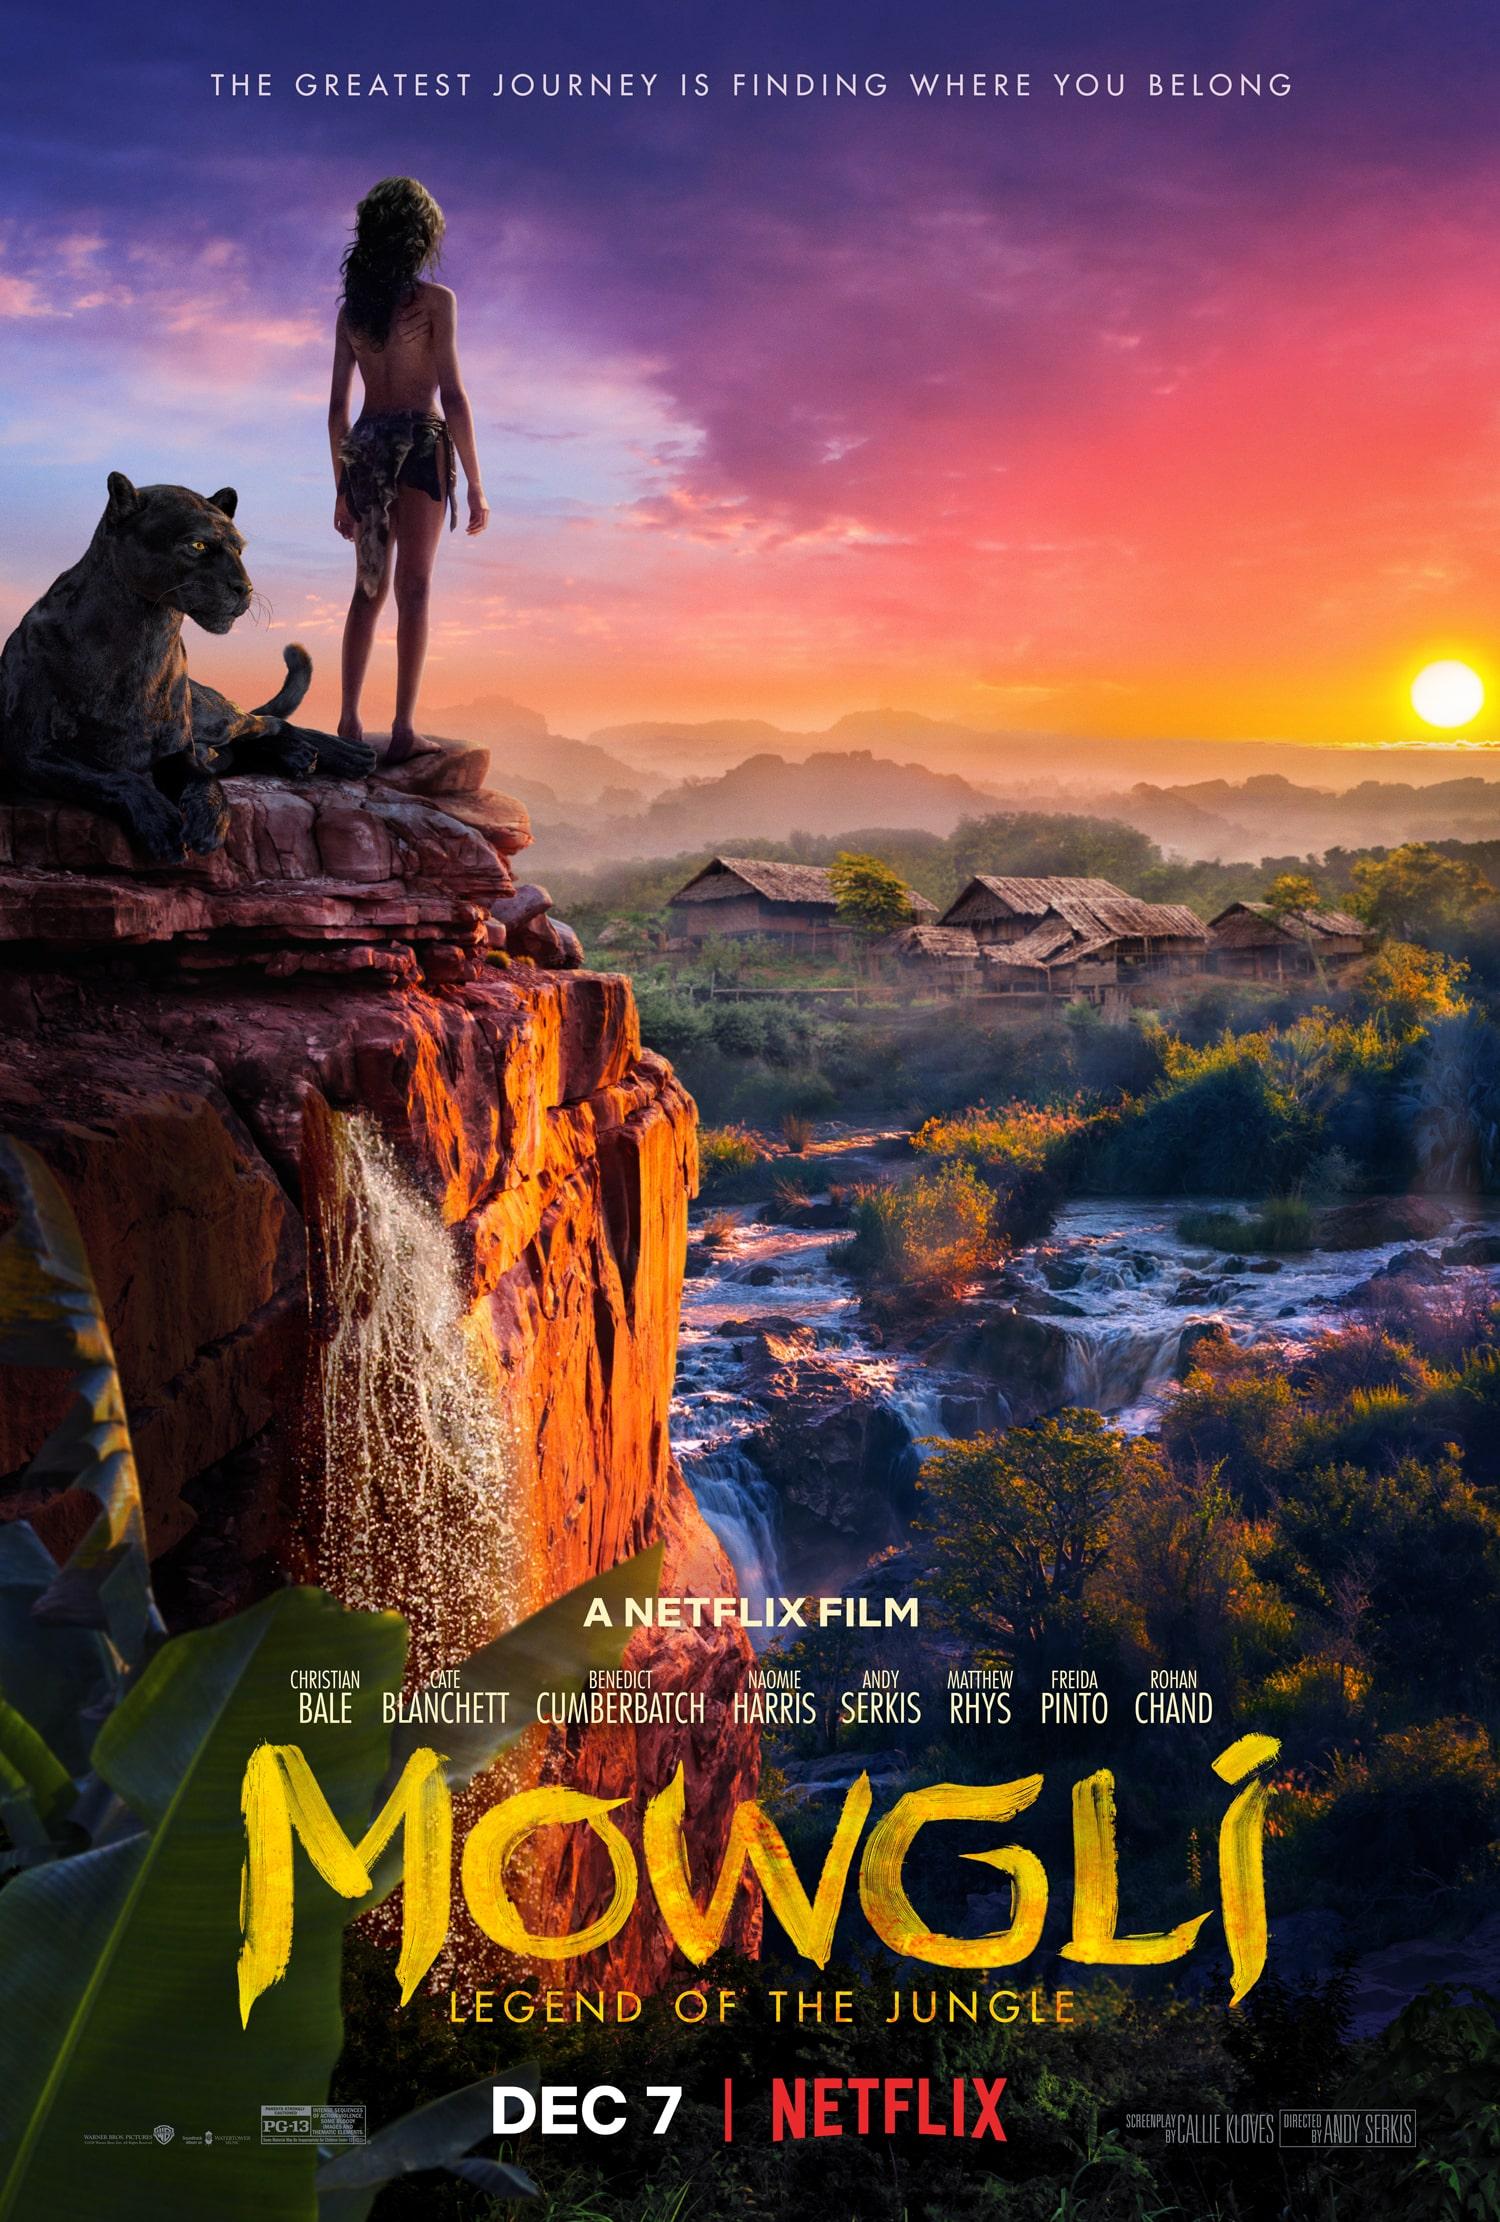 Oficiálny plagát k filmu Mowgli: Legend of the Jungle